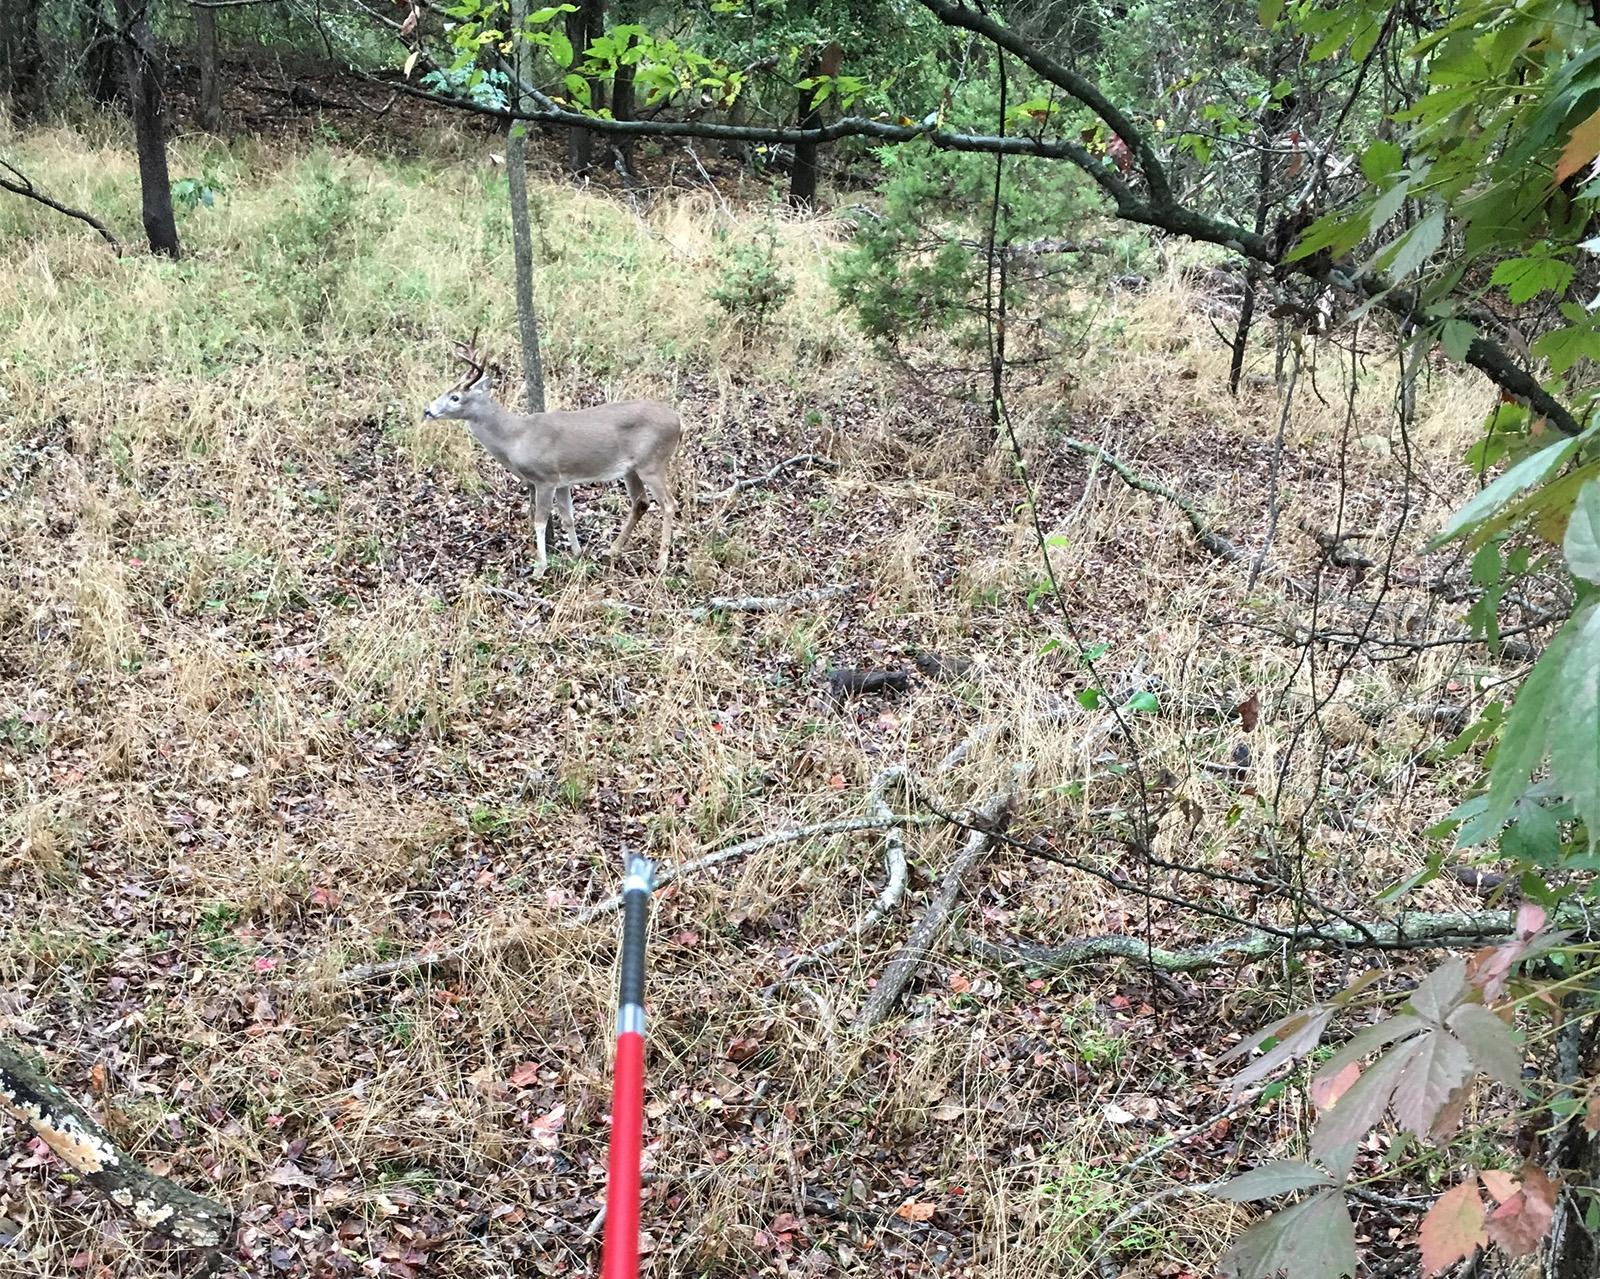 treestand-youngbuck-arrow-1600